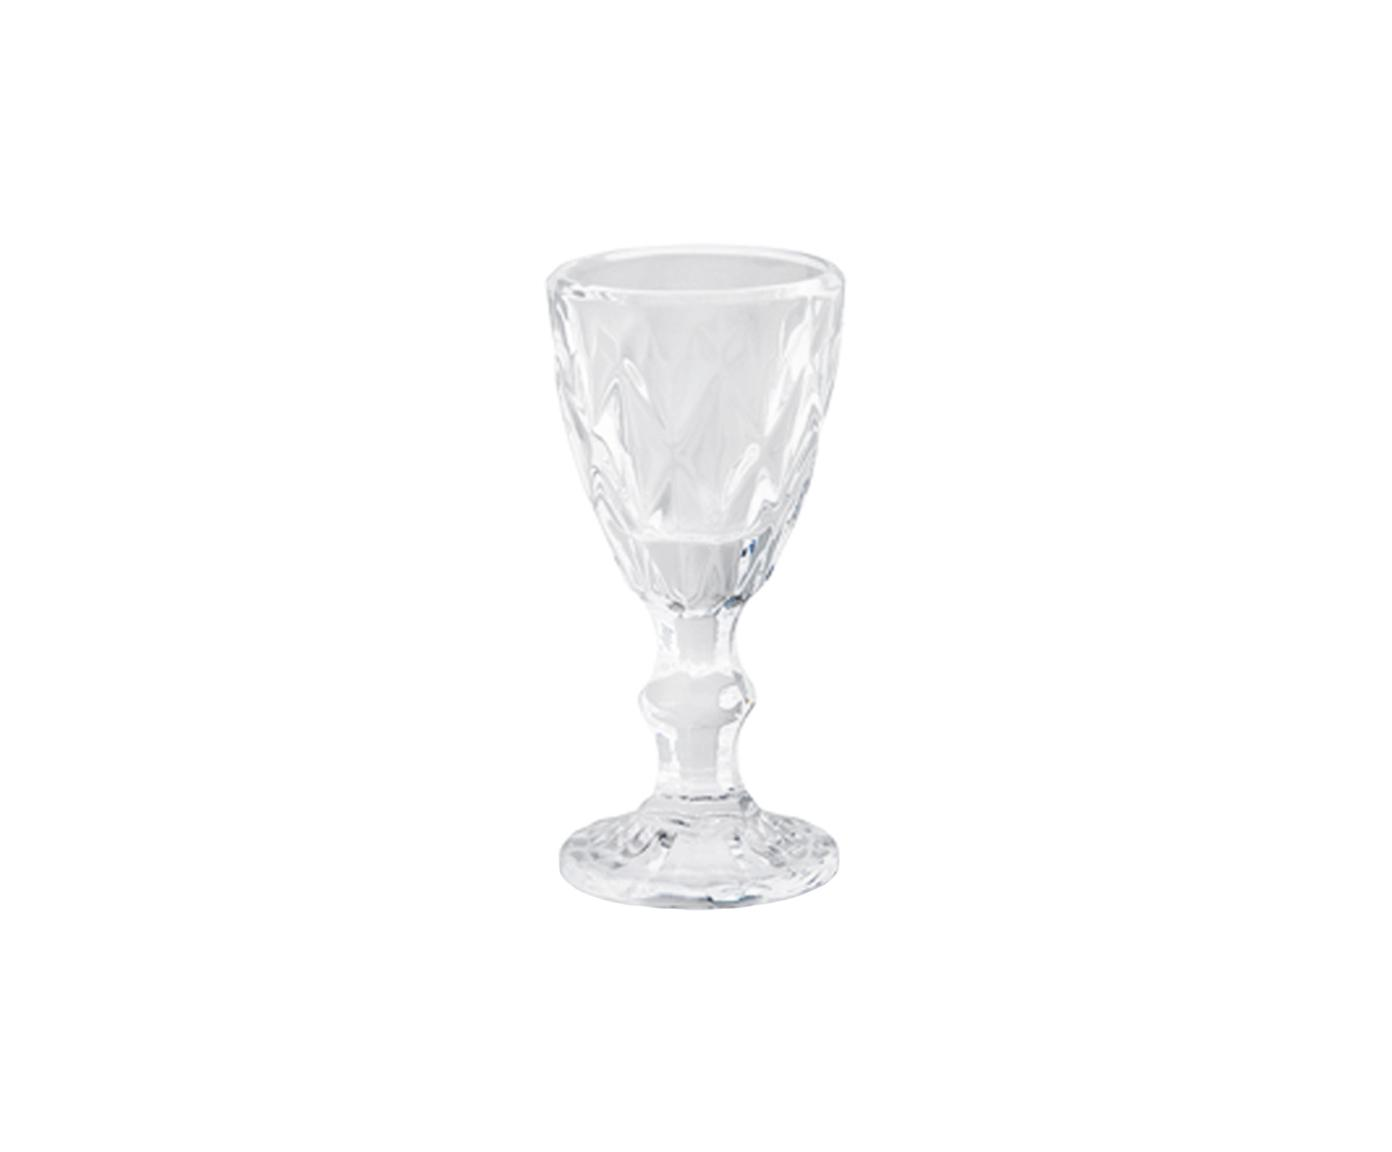 Borrelglaasjes Prisma, 6 stuks, Glas, Transparant, Ø 5 x H 11 cm